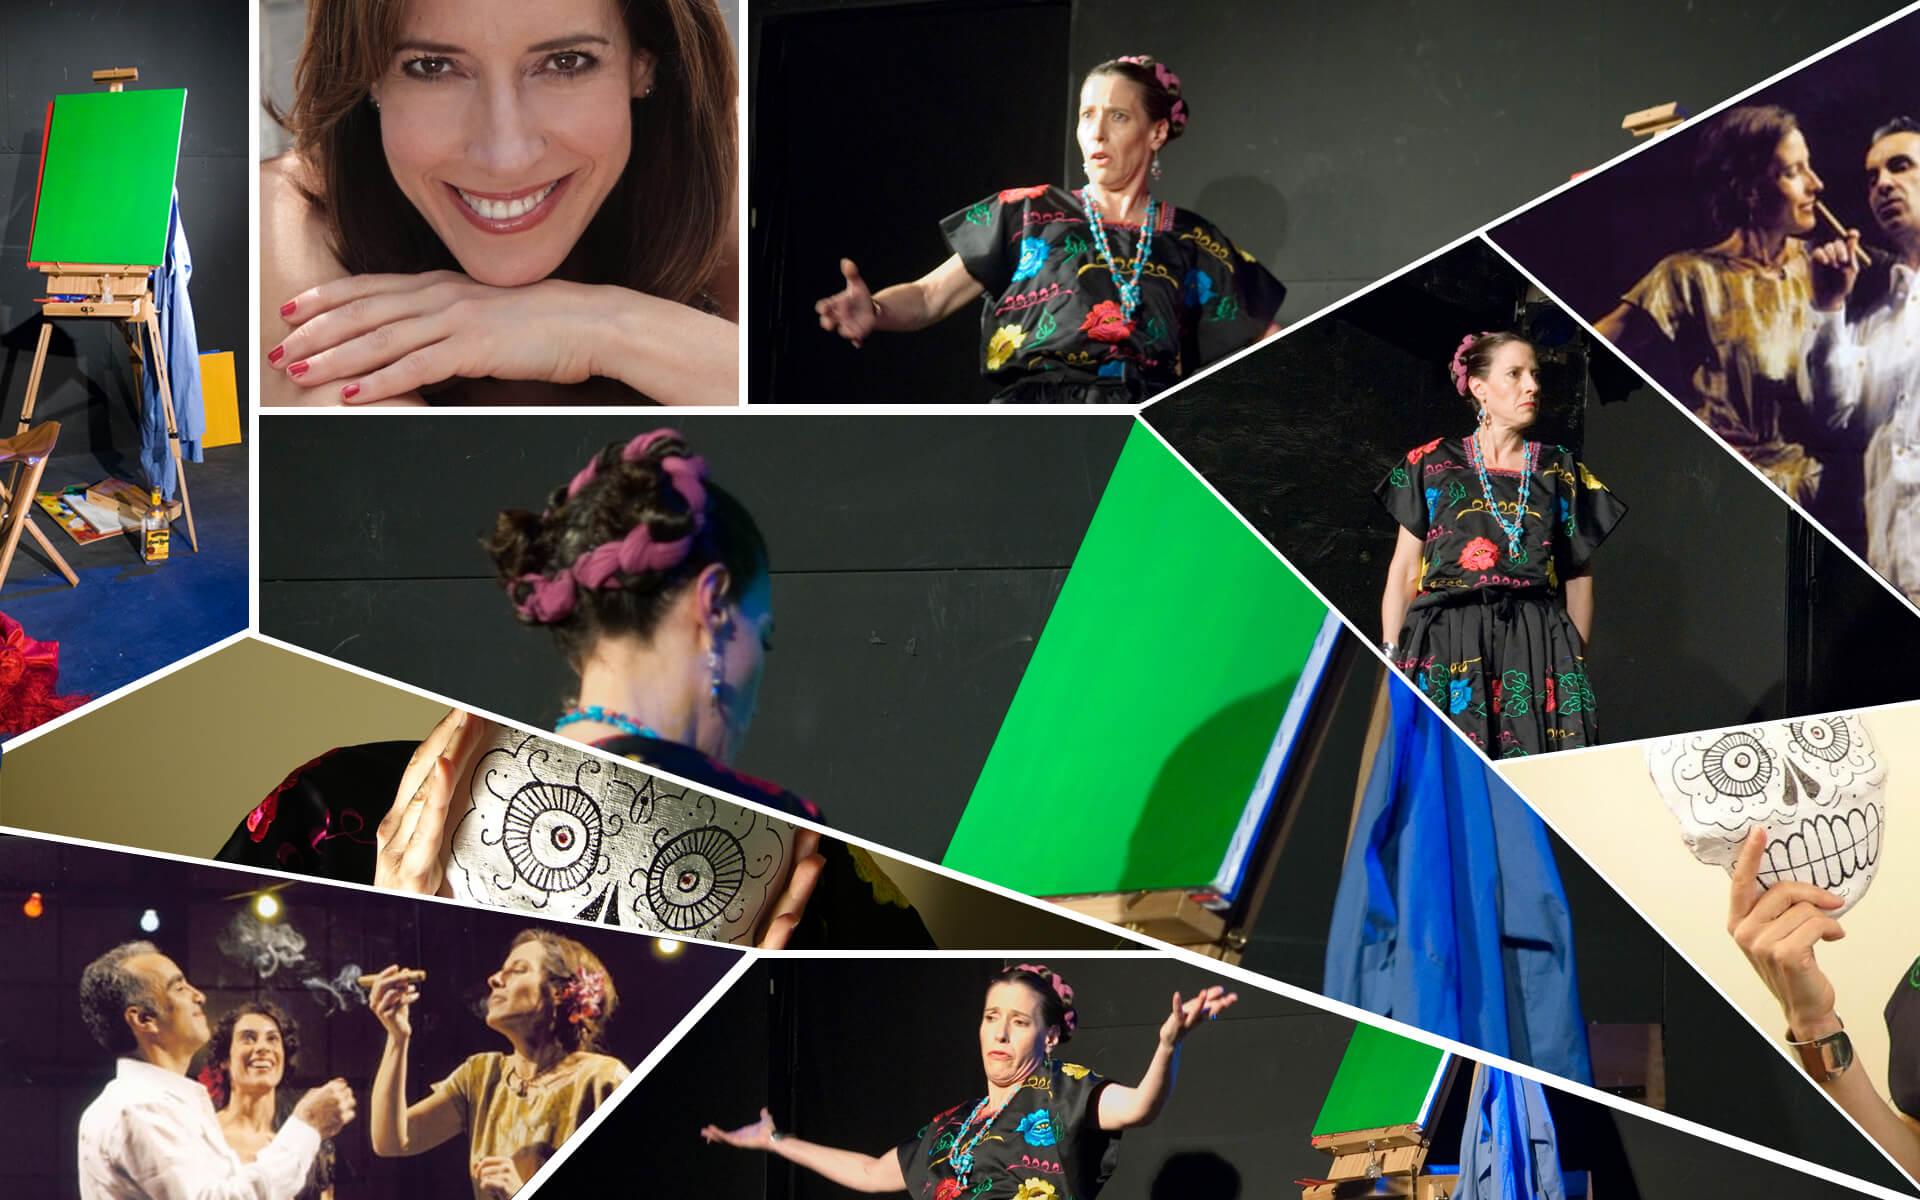 Marian Licha On Stage